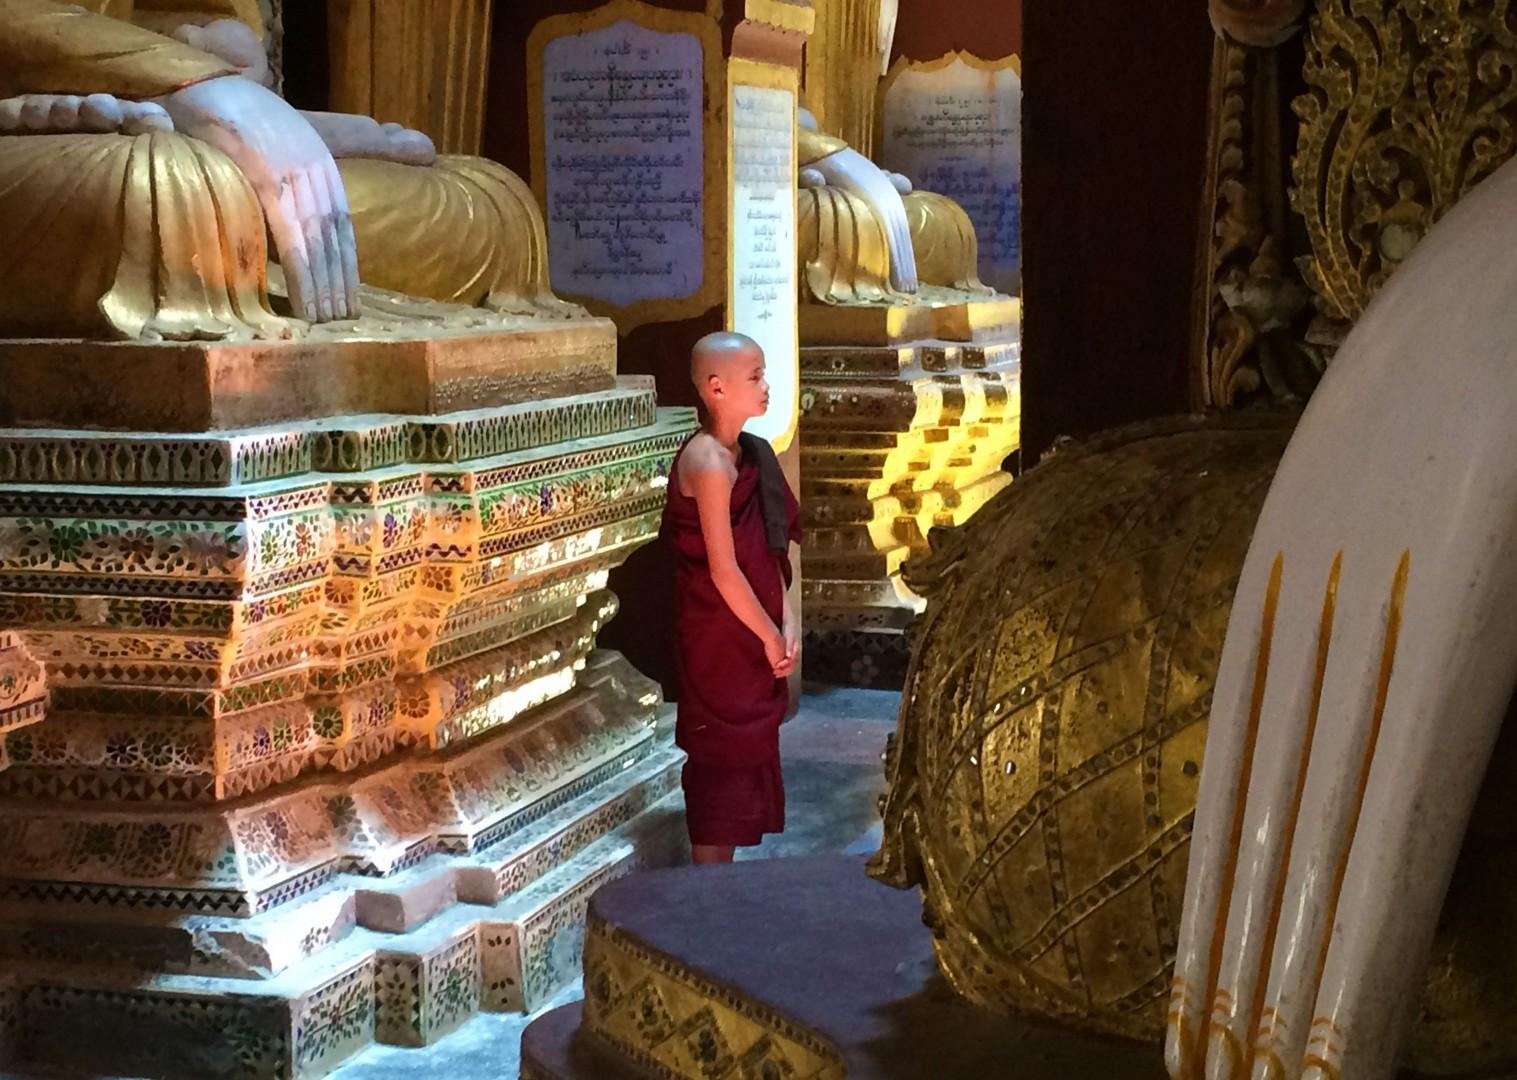 authentic-experience-burma-group-cycling-holidays.jpg - Myanmar (Burma) - Bagan and Beyond - Cycling Adventures